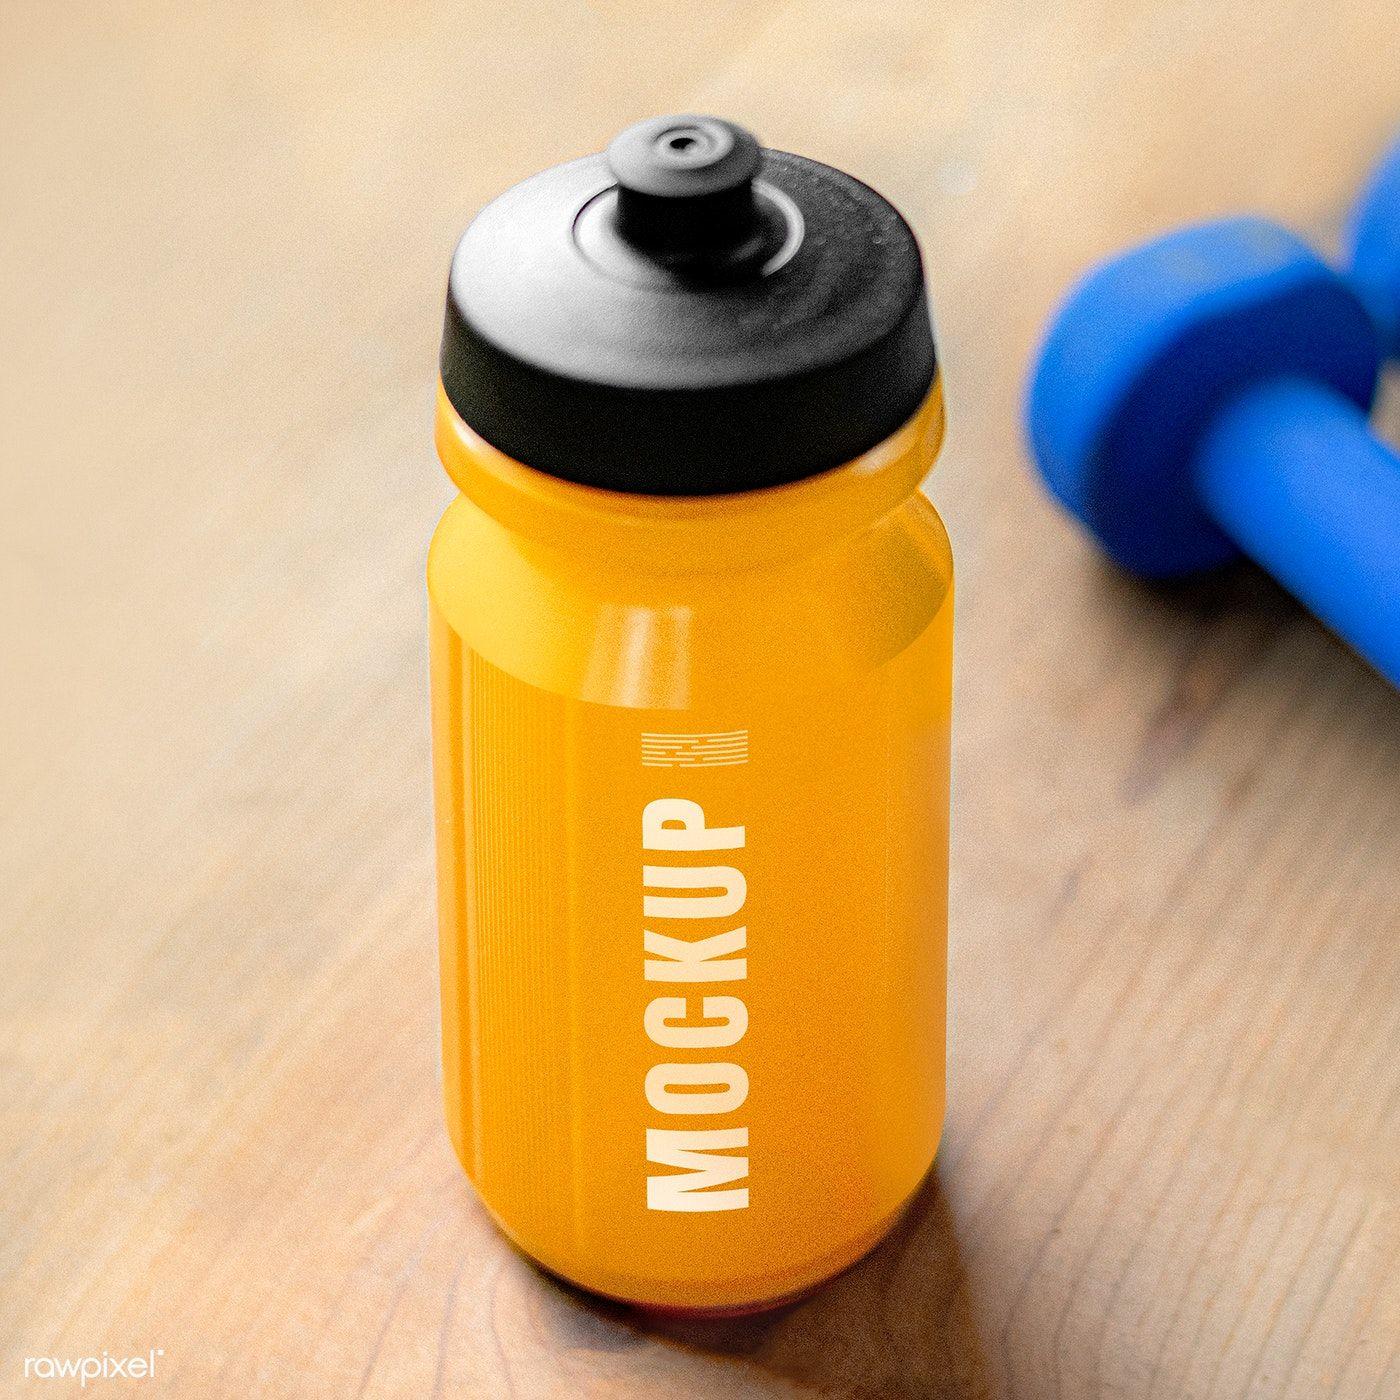 Download Premium Psd Of Reusable Sports Bottle Mockup Design 2194480 Bottle Mockup Sport Bottle Bottle